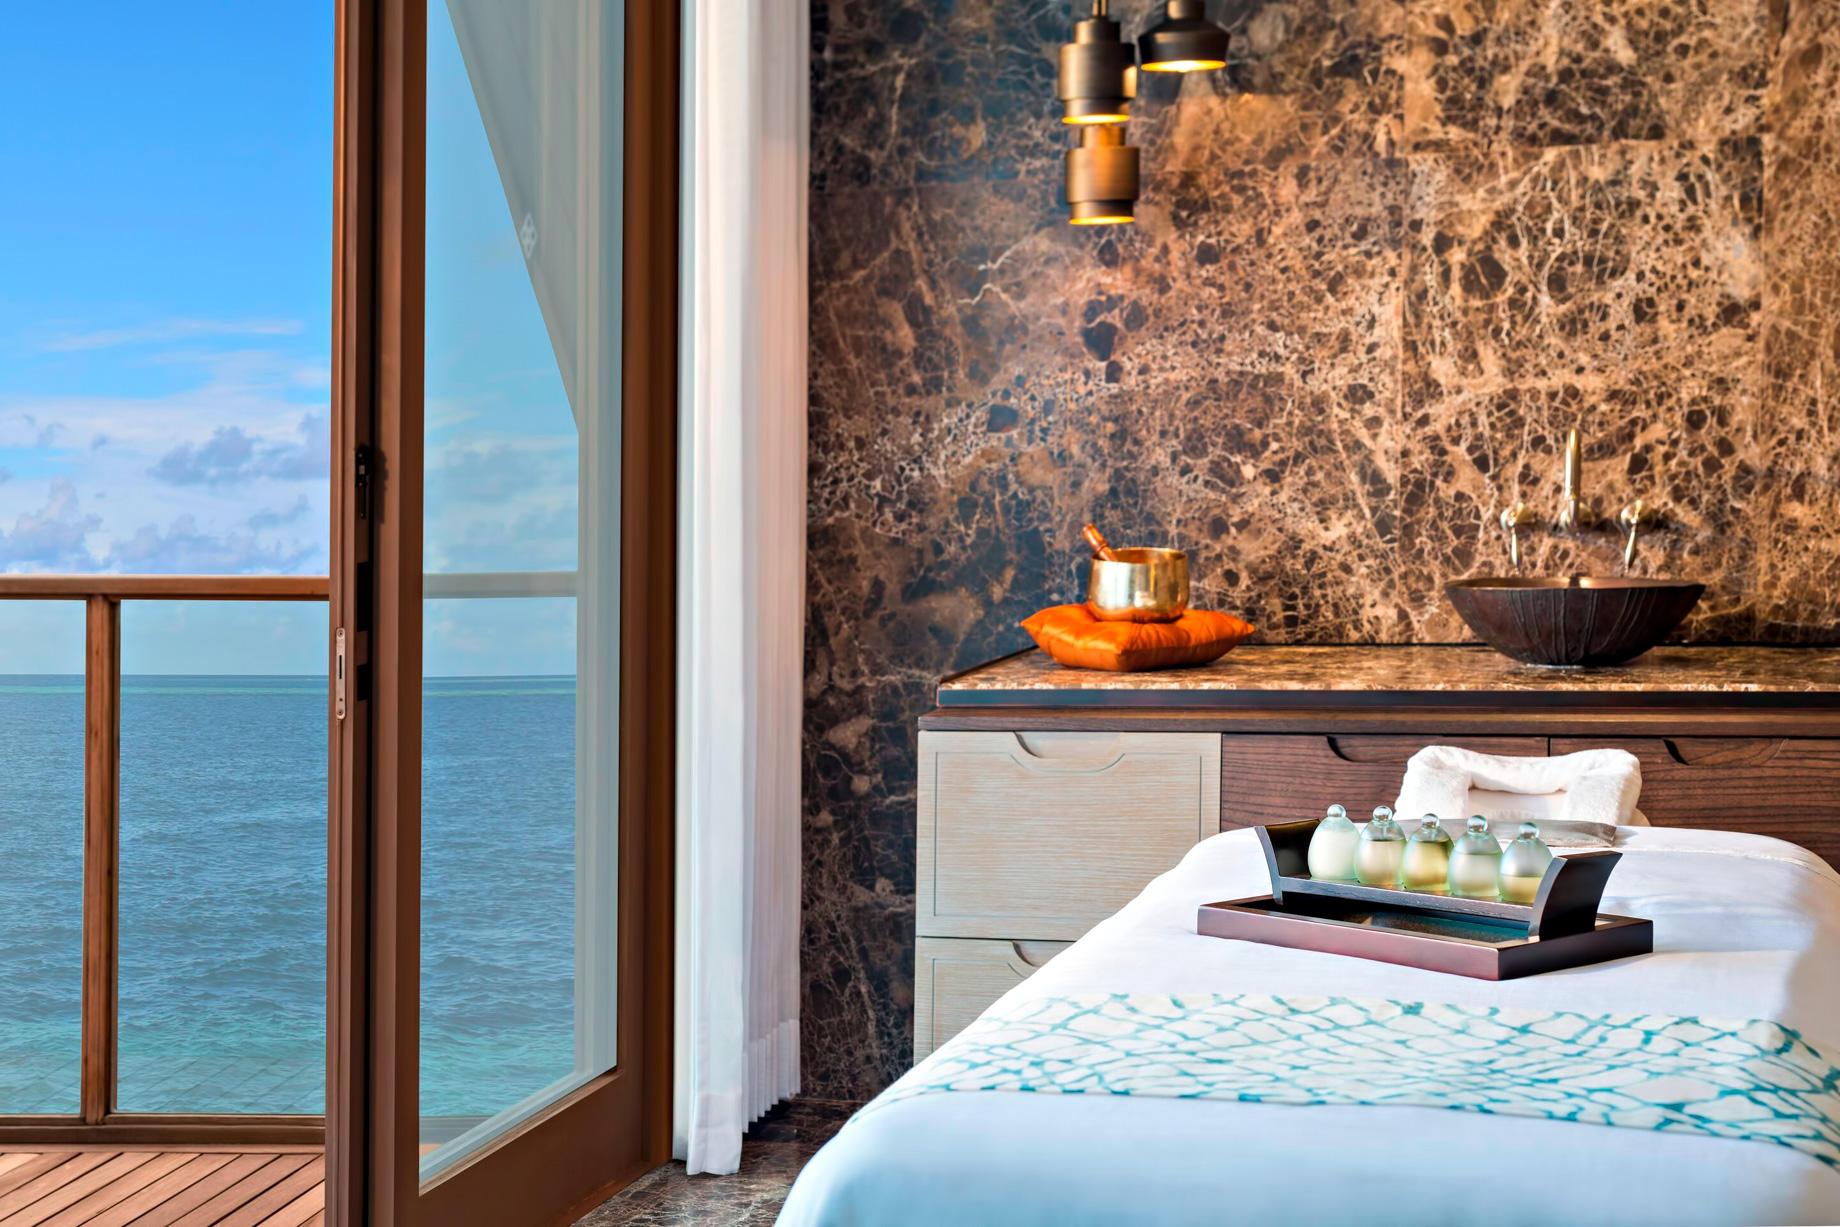 The St. Regis Maldives Vommuli Luxury Resort – Dhaalu Atoll, Maldives – John Jacob Astor Estate Spa